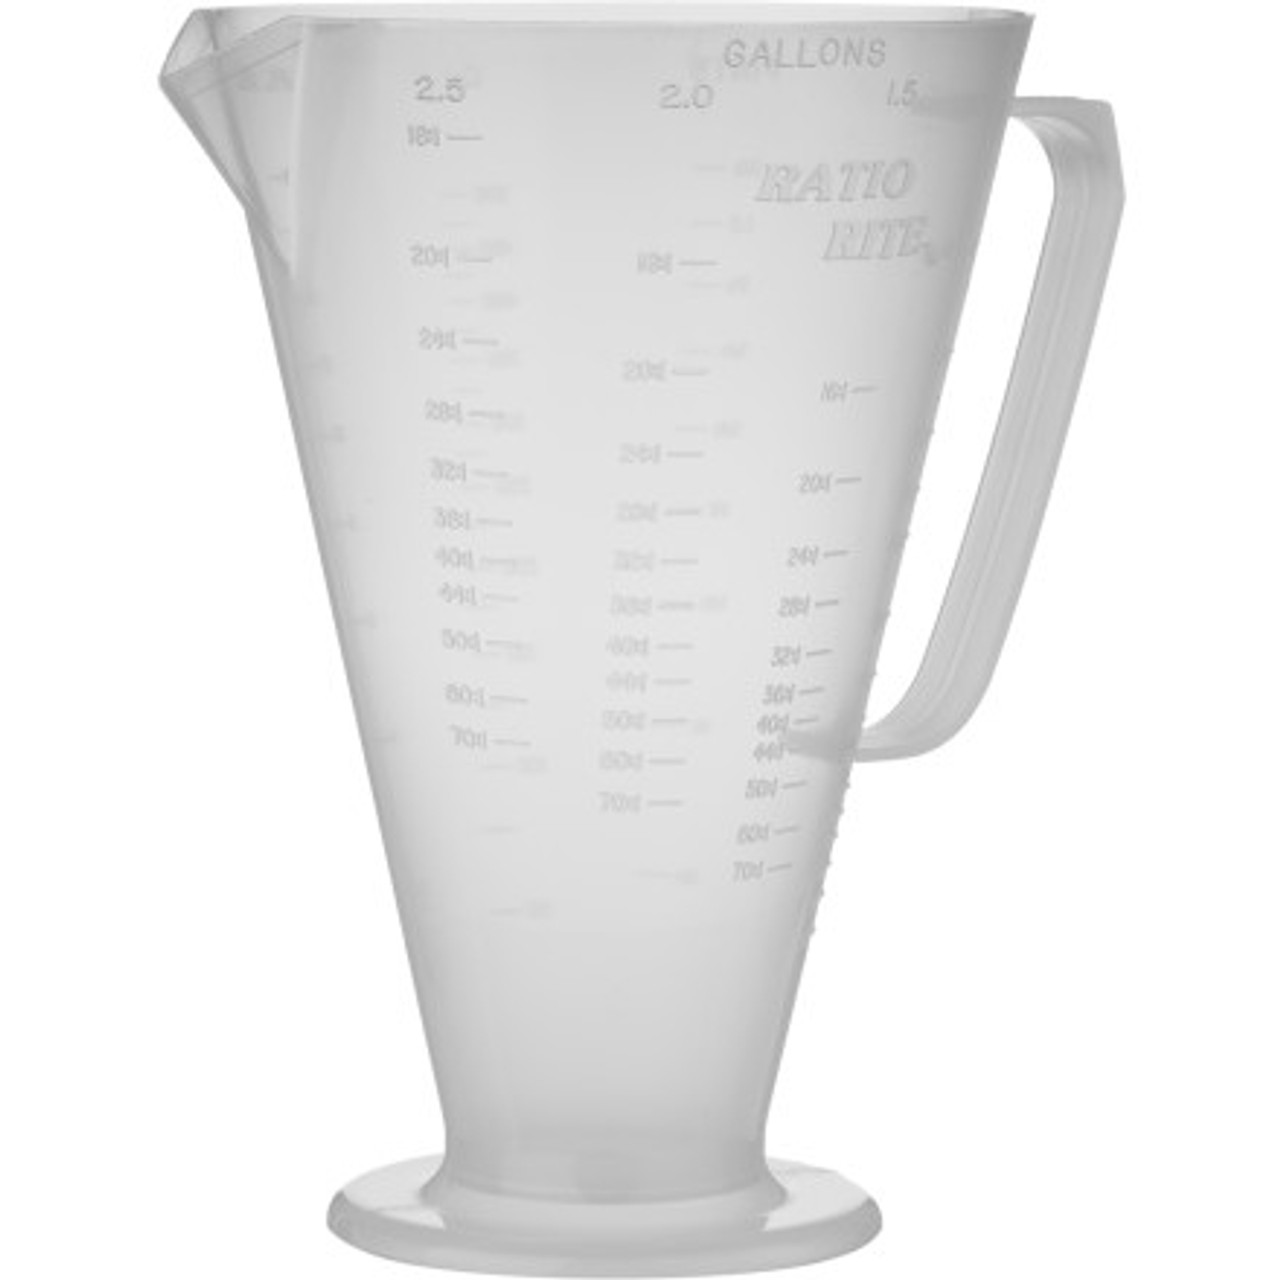 Ratio Rite Premix Gas Fuel Oil Mixer Mixing 2-Stroke Measuring Cup With Lid,cap